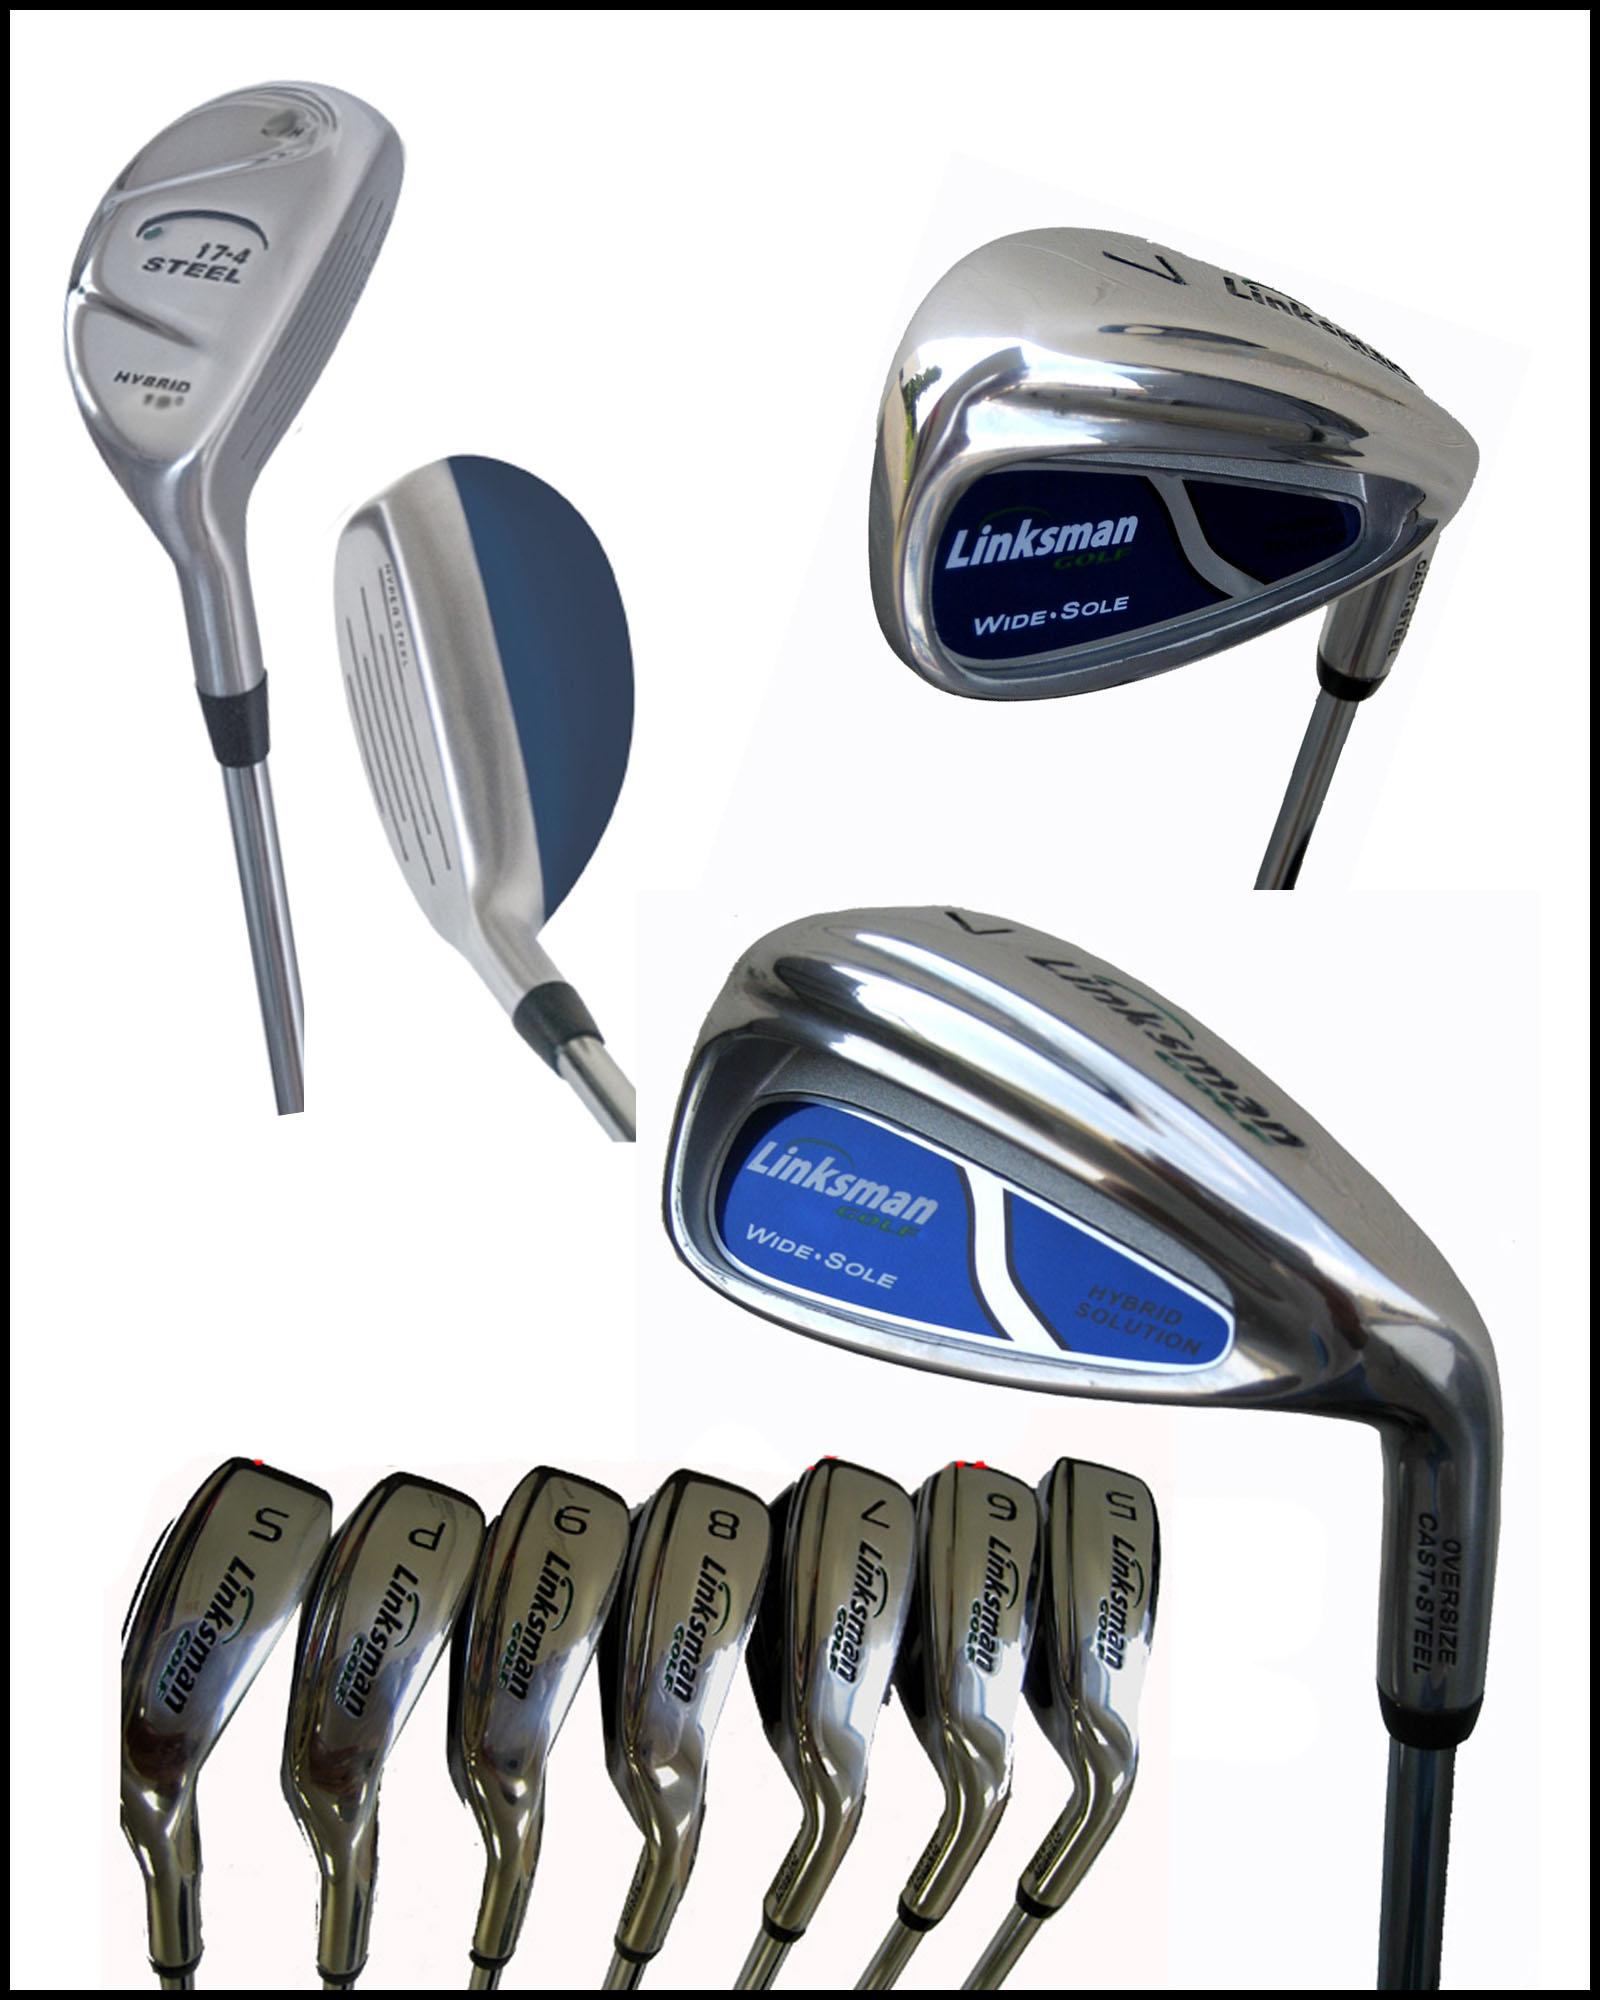 new linksman golf 1 tall mens golf club set hybrid irons. Black Bedroom Furniture Sets. Home Design Ideas